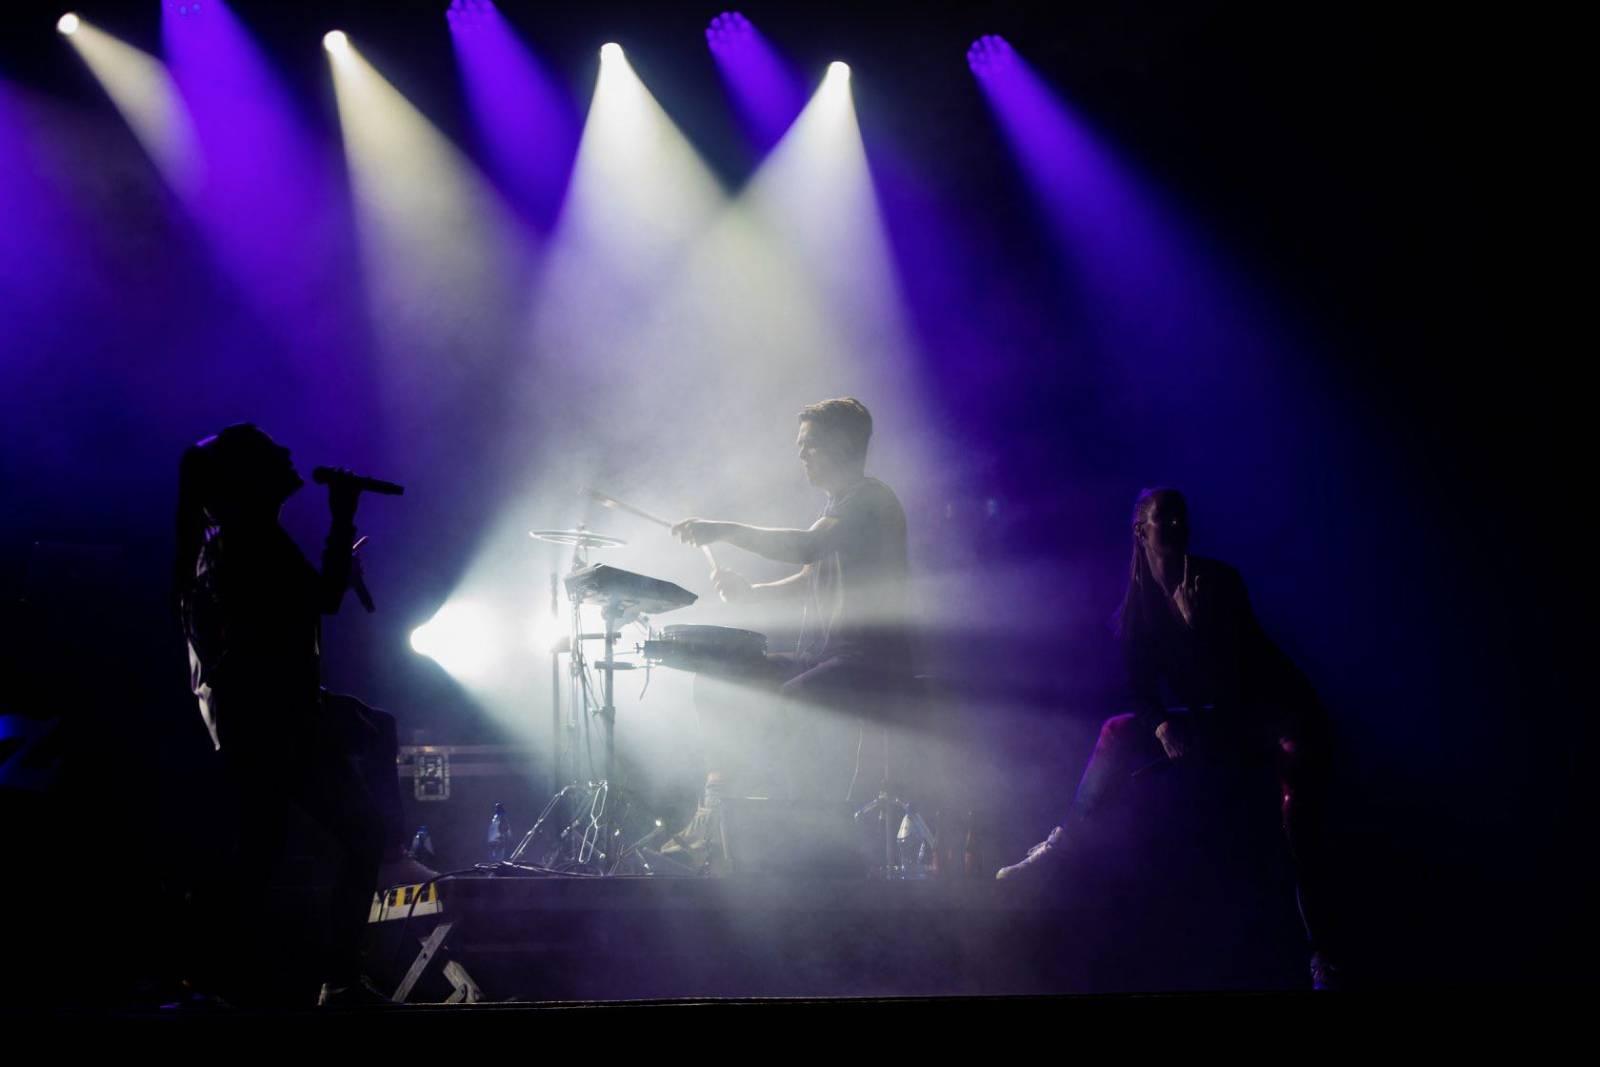 Hofnar - Licht & Geluid - Audiovisuele Diensten - DJ - Artiesten - House of Weddings - House of Events - 3